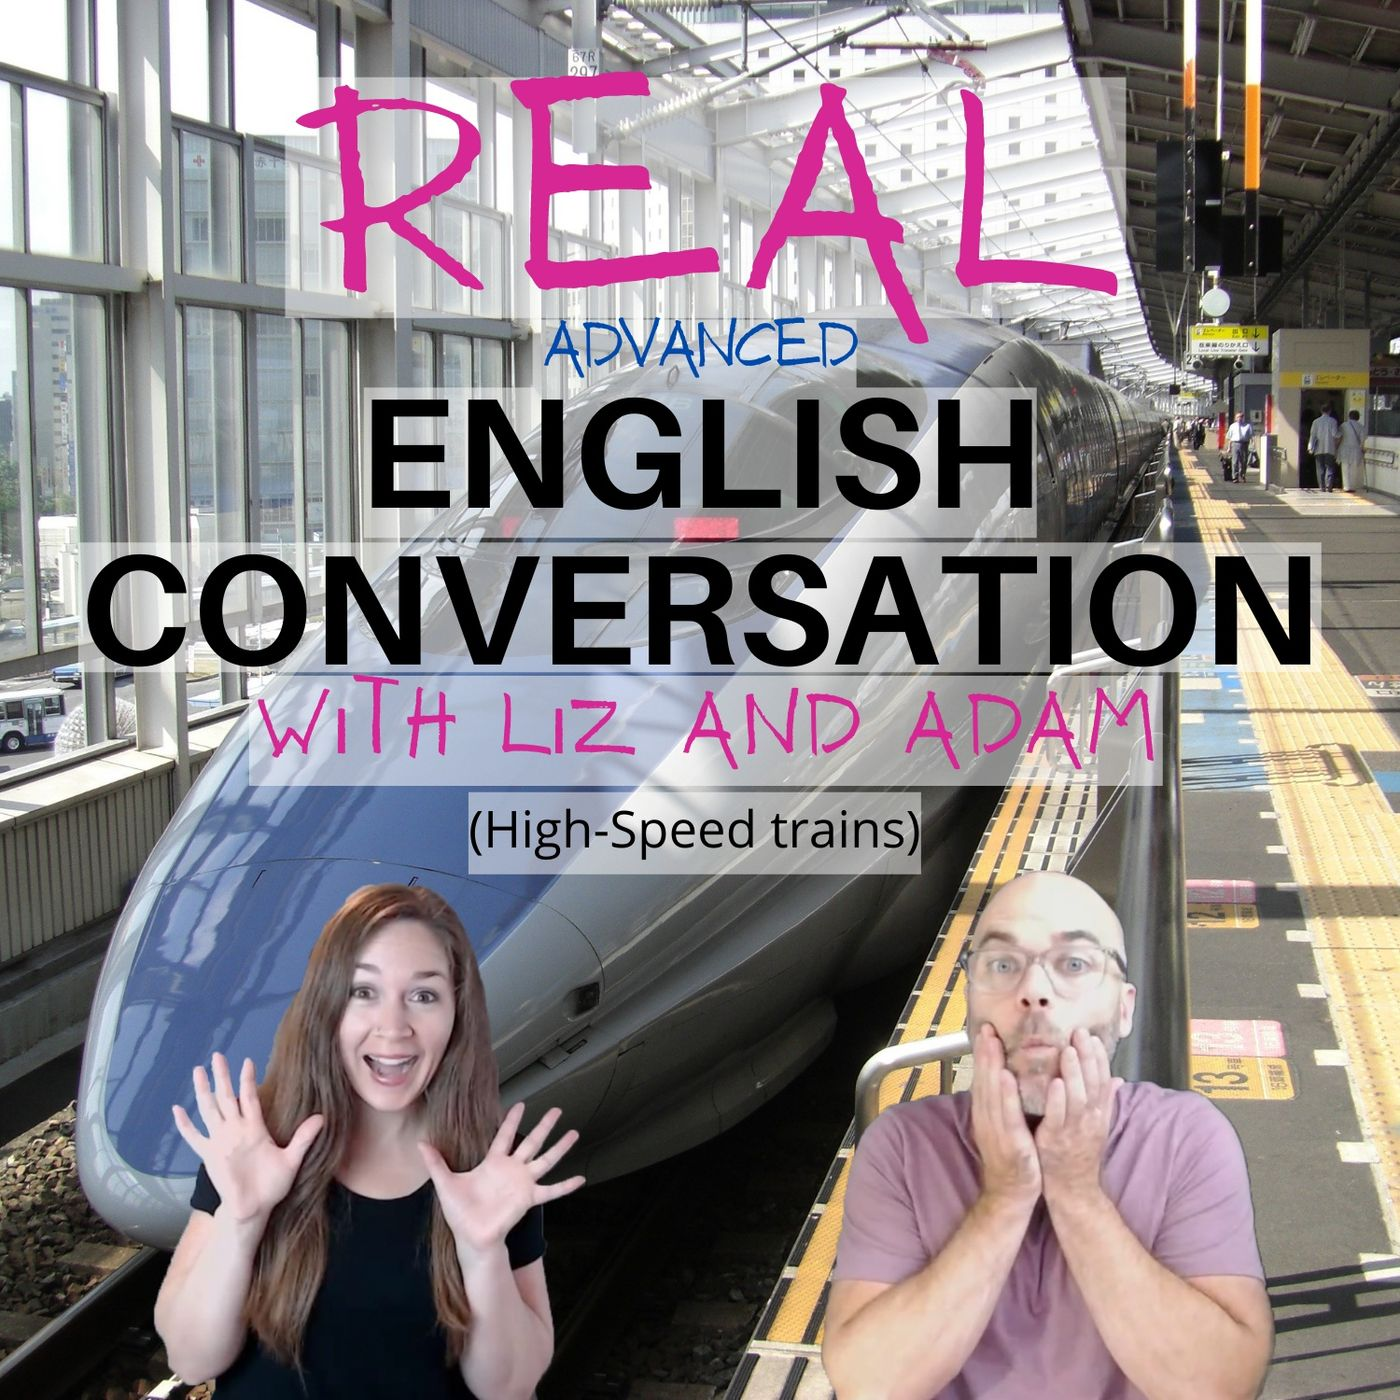 Are Trains the Best Method of Transportation? (Conversation Program)